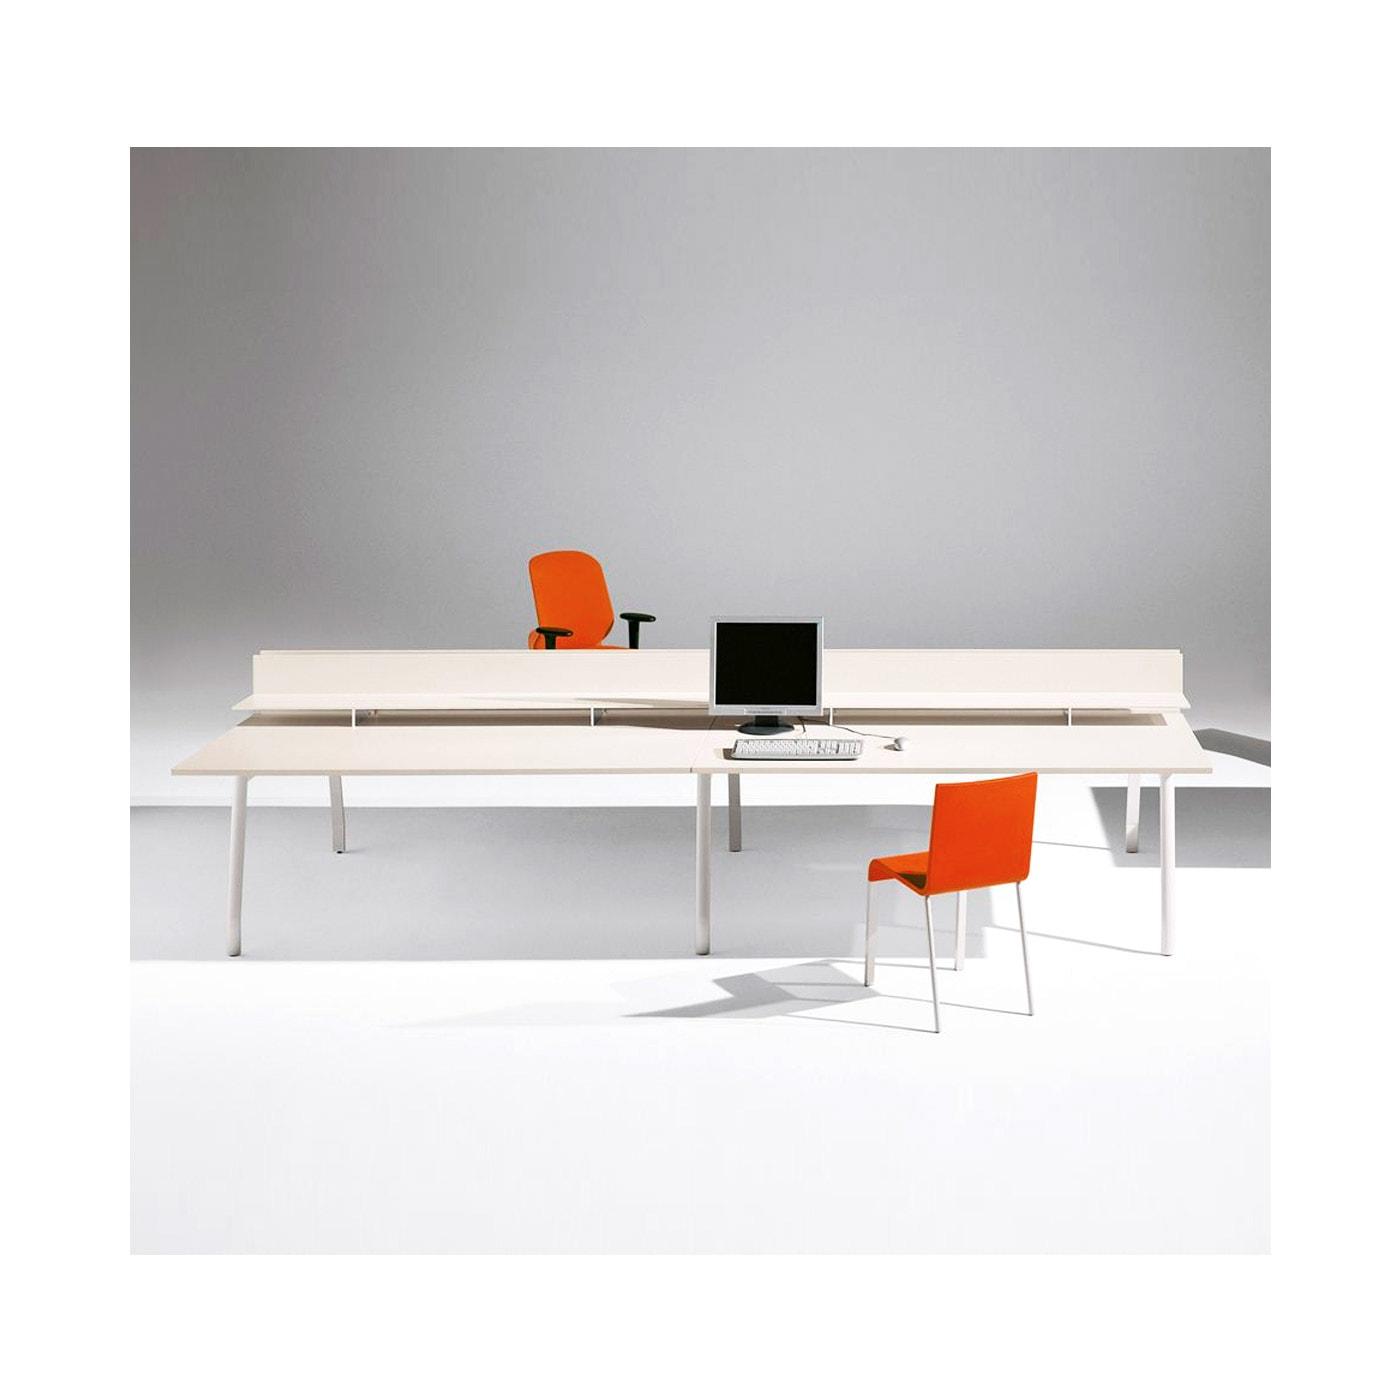 UNIFOR MDL tavolo bench